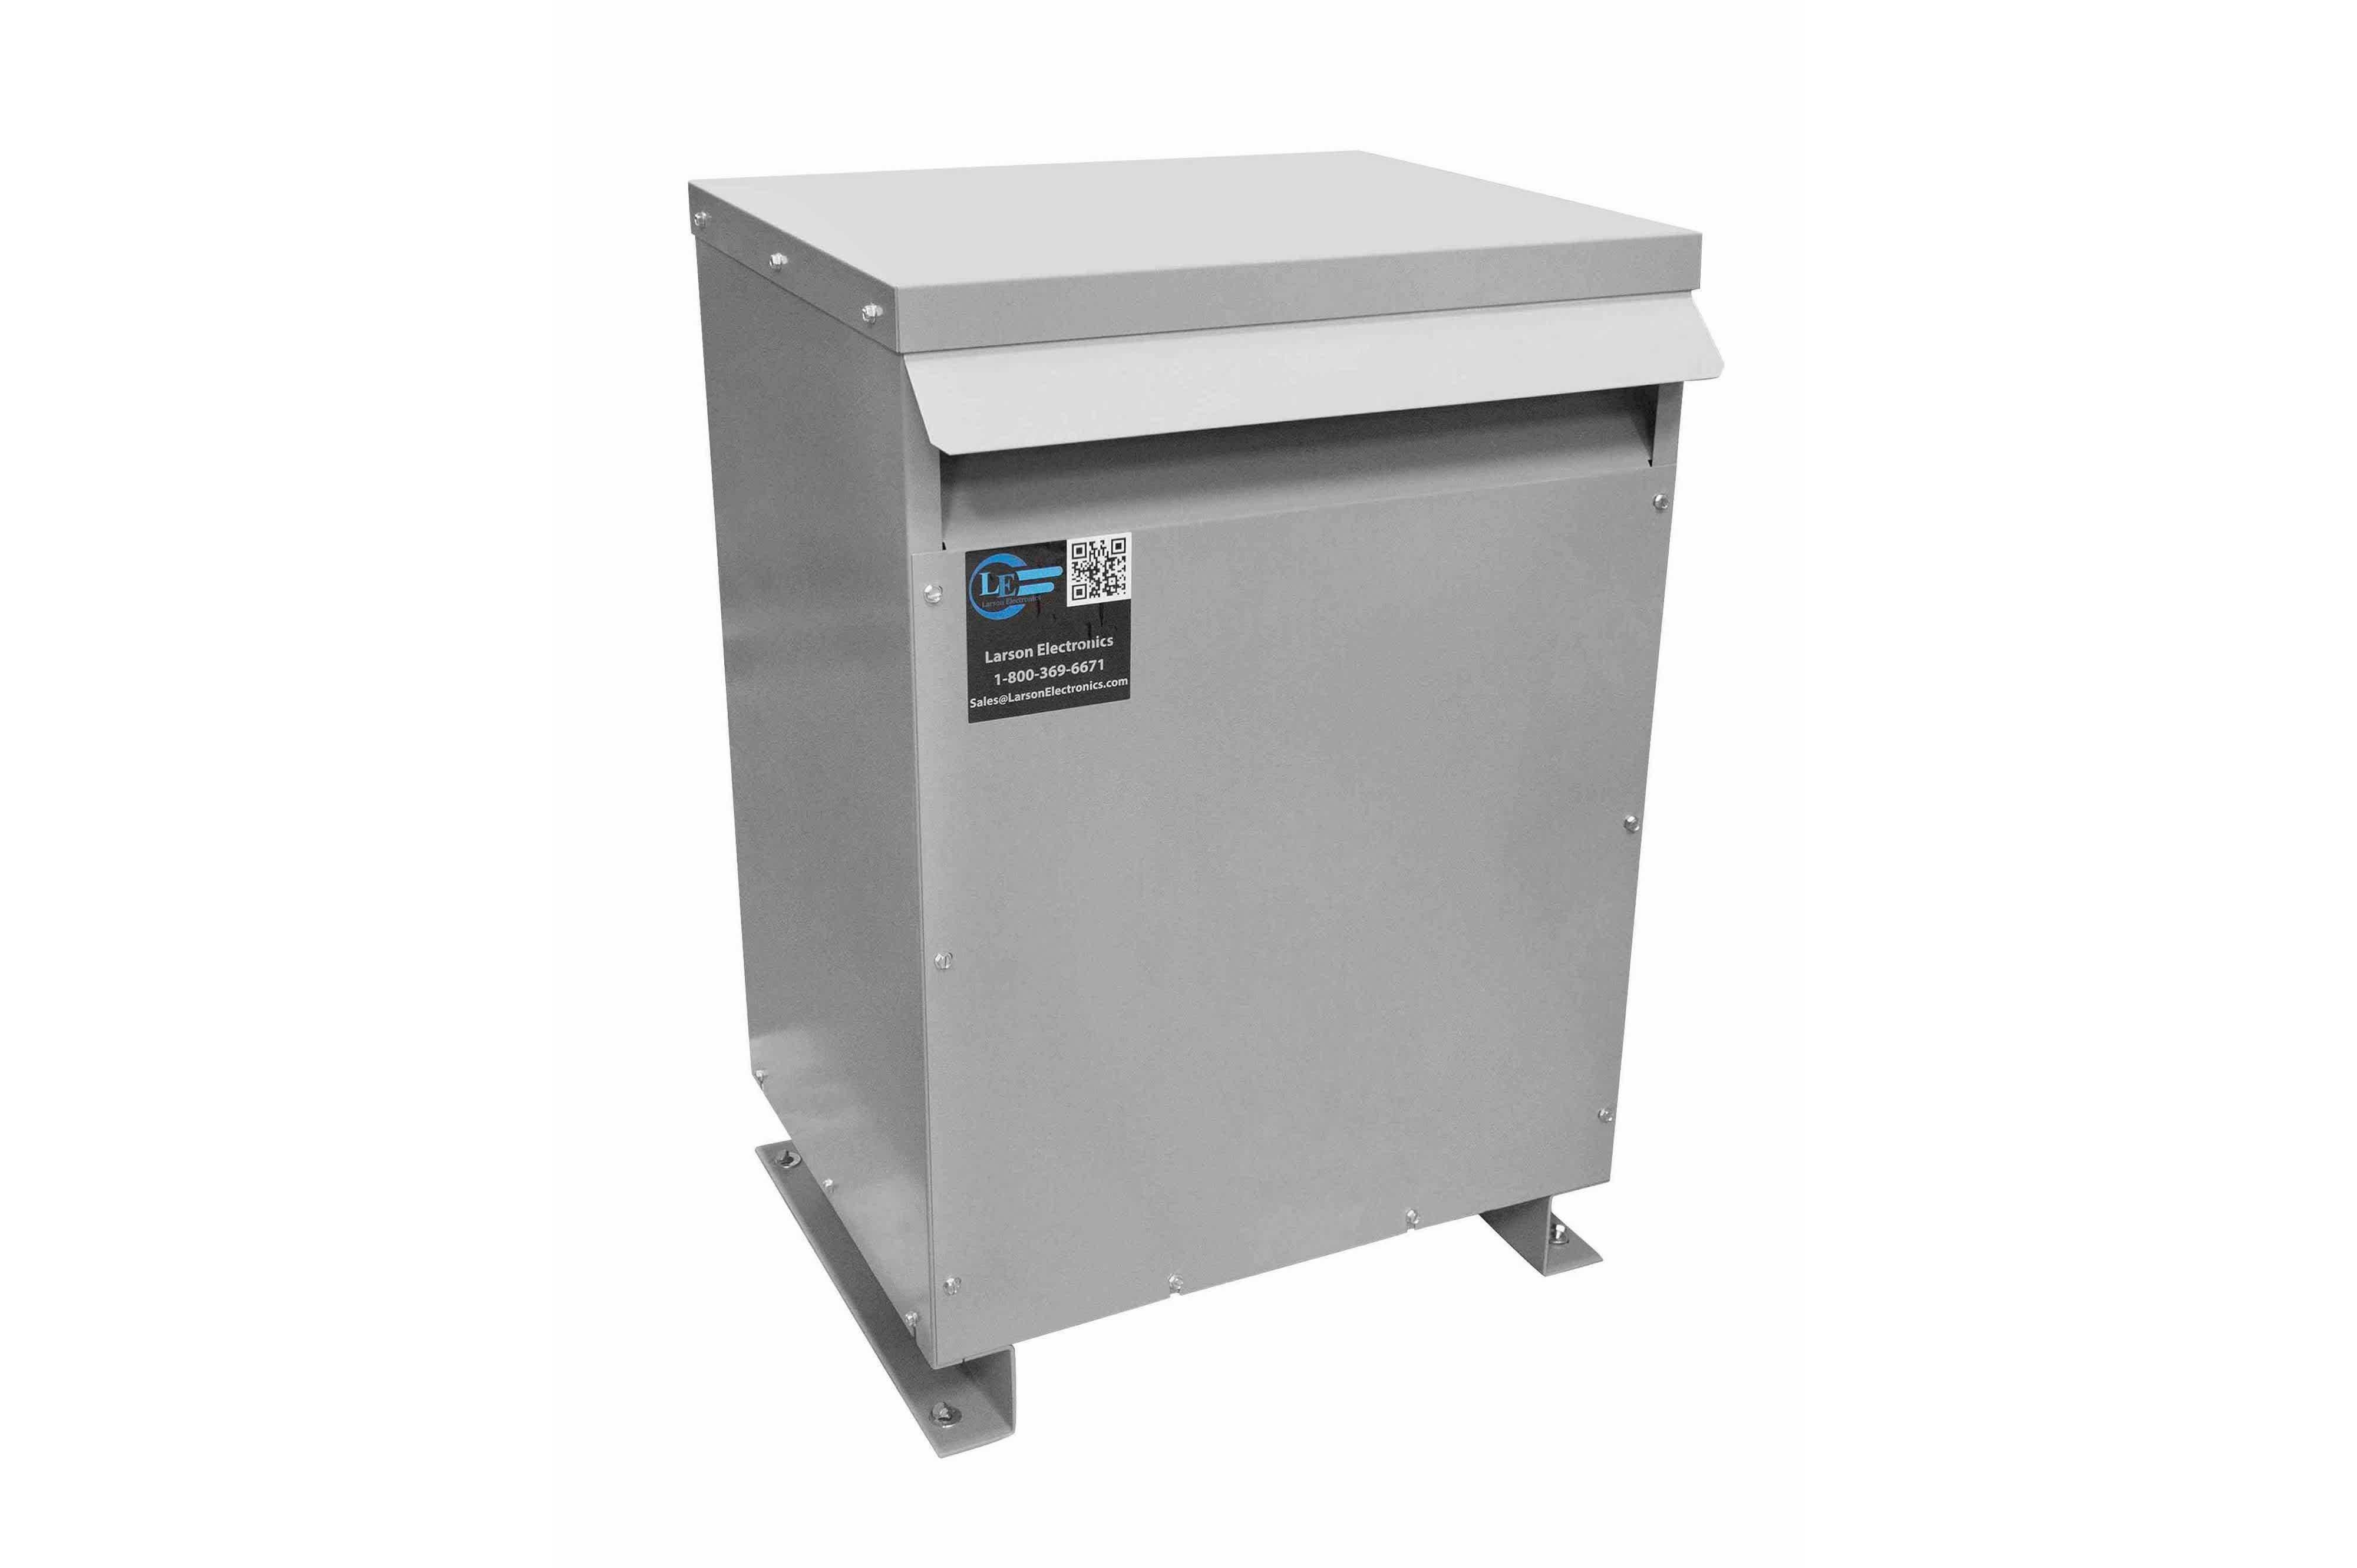 800 kVA 3PH DOE Transformer, 400V Delta Primary, 208Y/120 Wye-N Secondary, N3R, Ventilated, 60 Hz